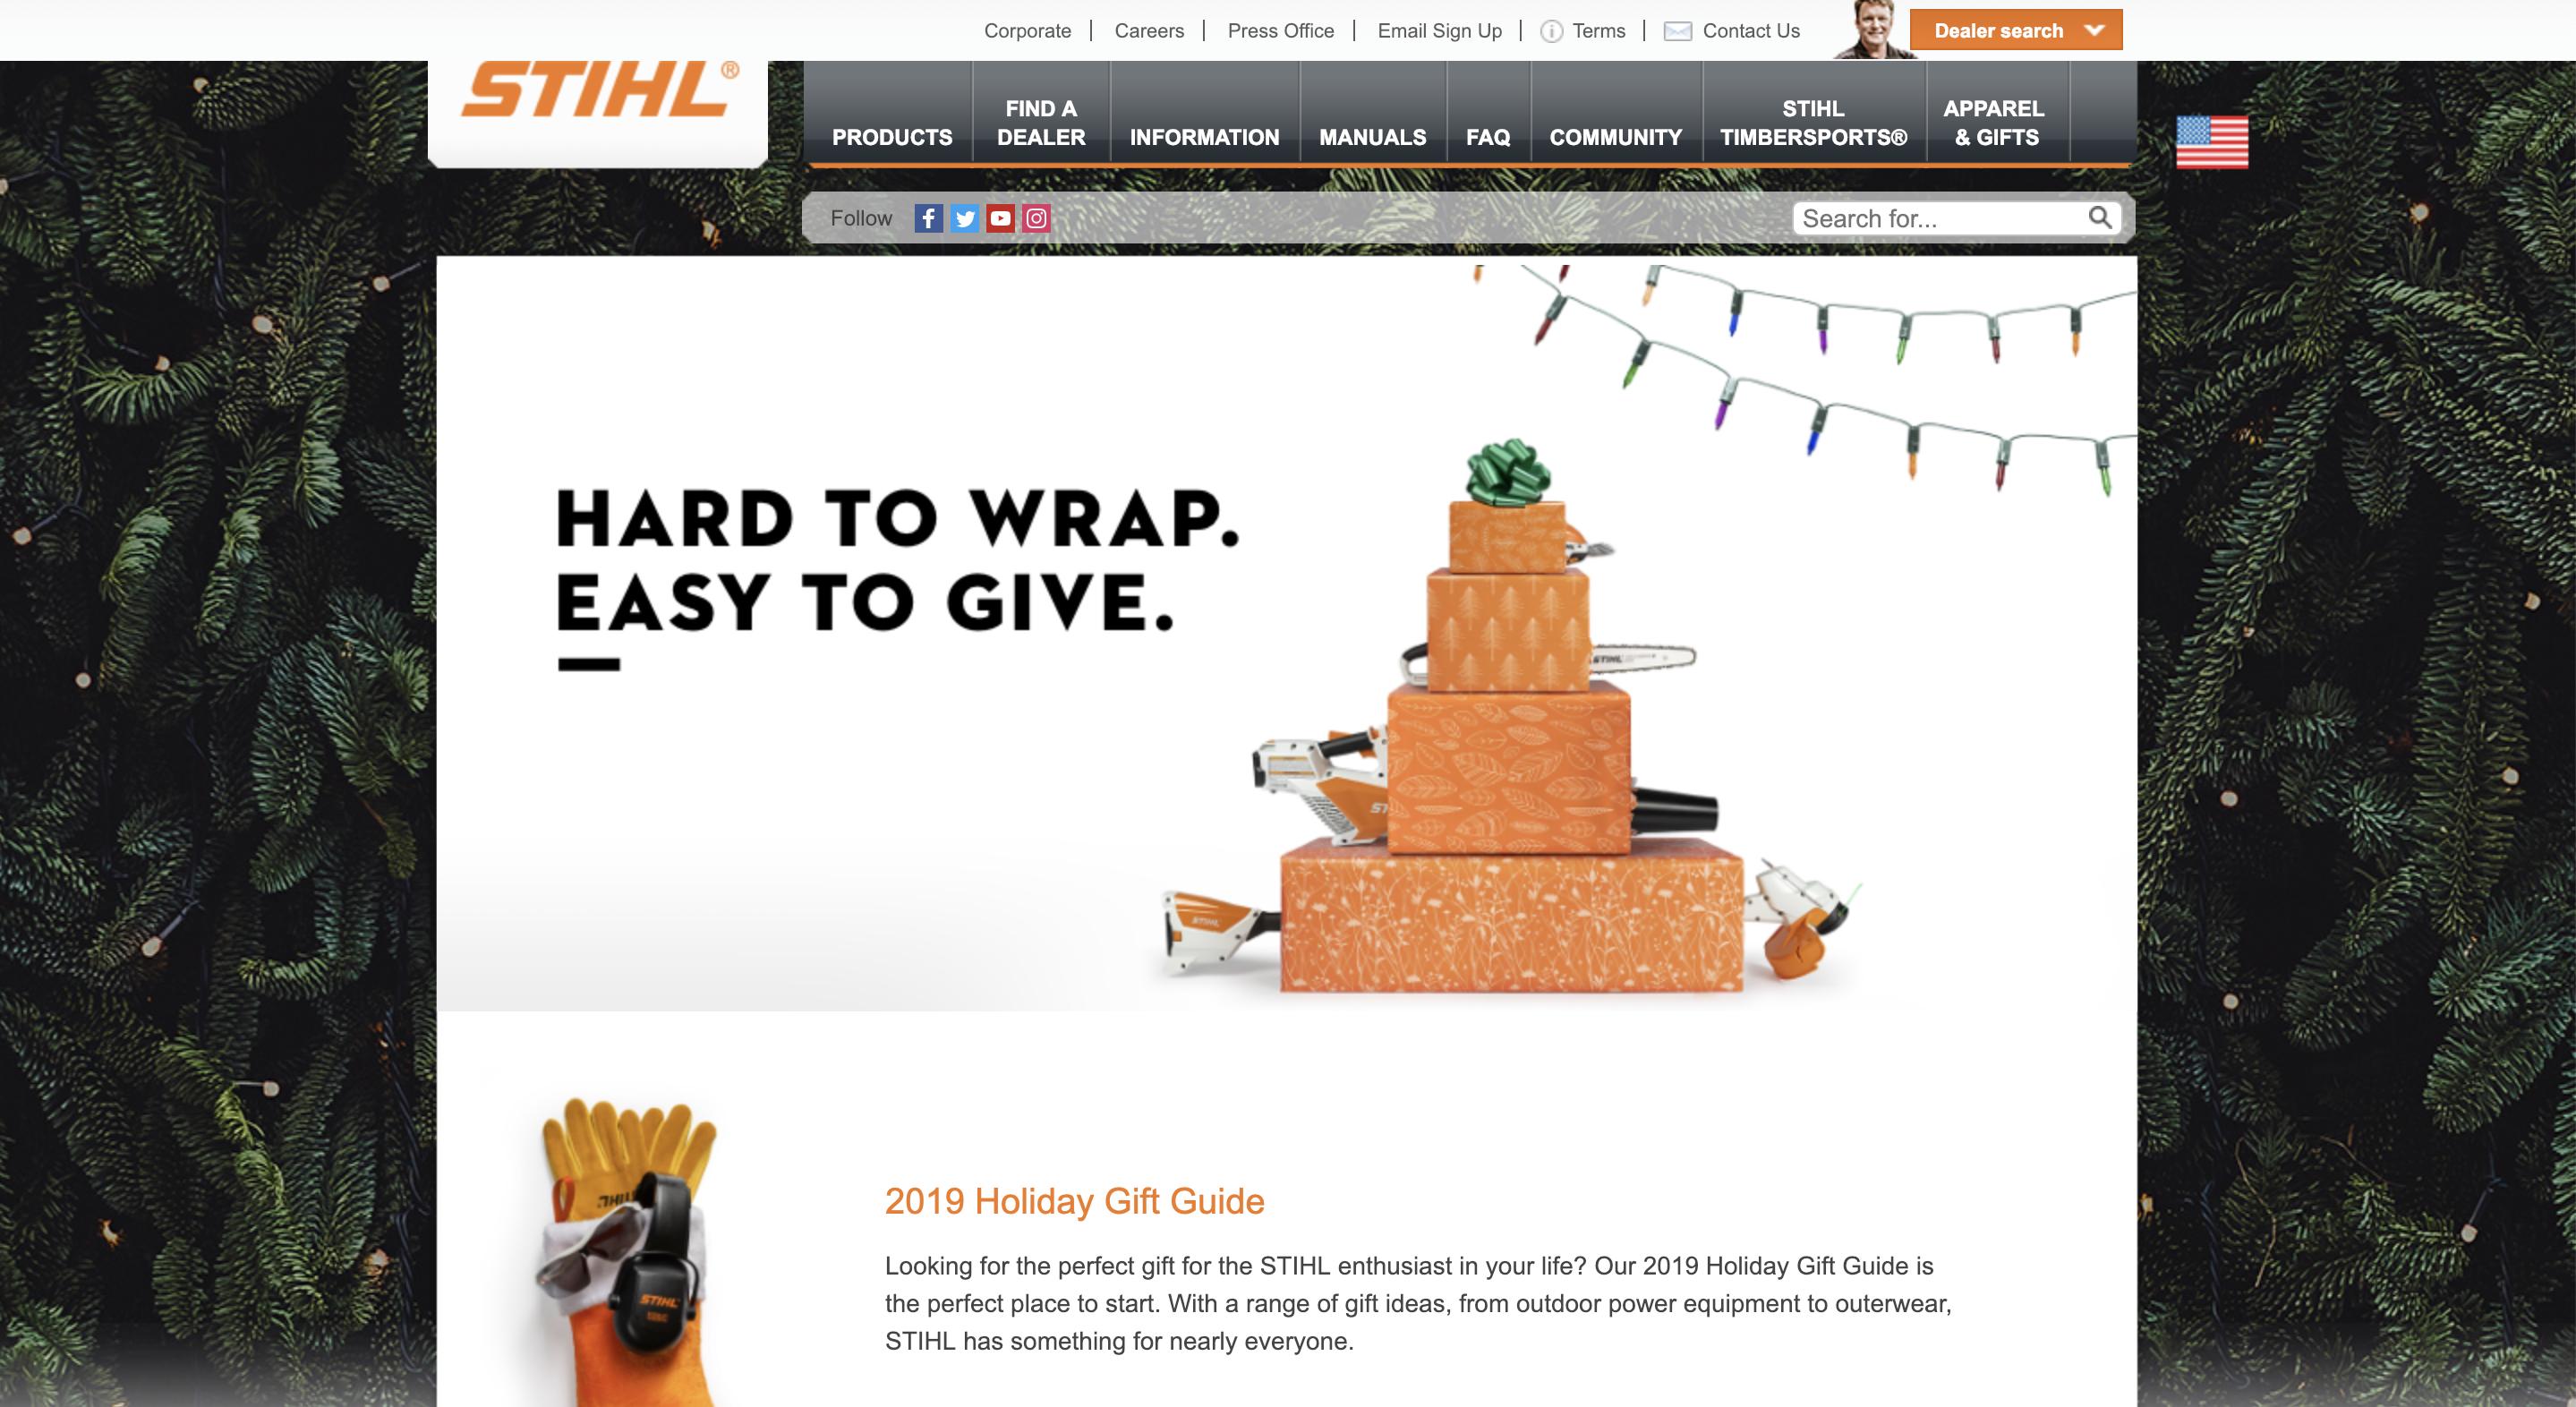 stihl-holiday-gift-guide-screenshot